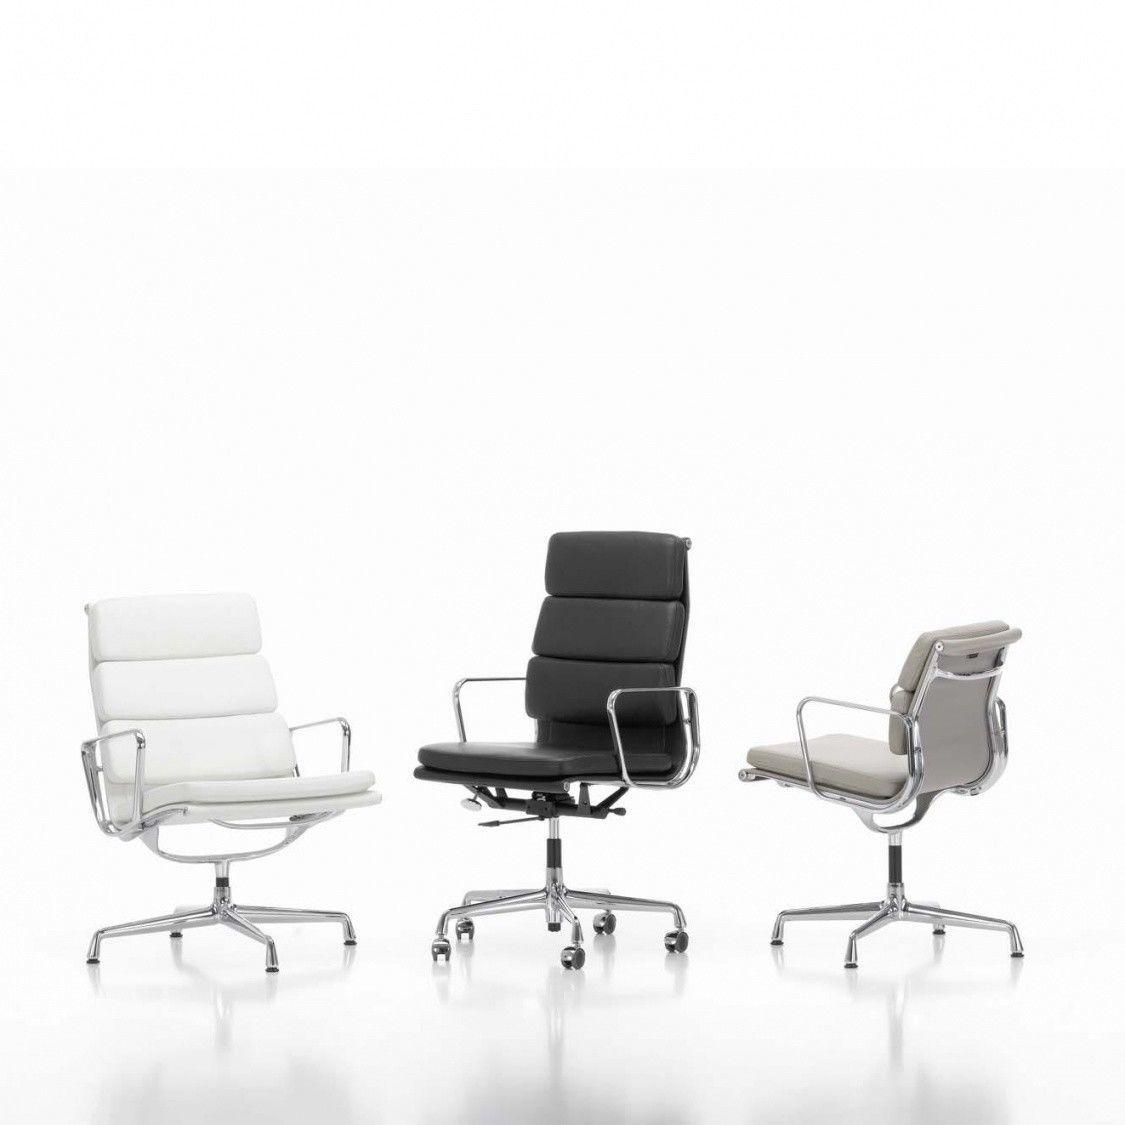 Ea 219 soft pad eames chair chaise de bureau vitra for Chaise de bureau eames